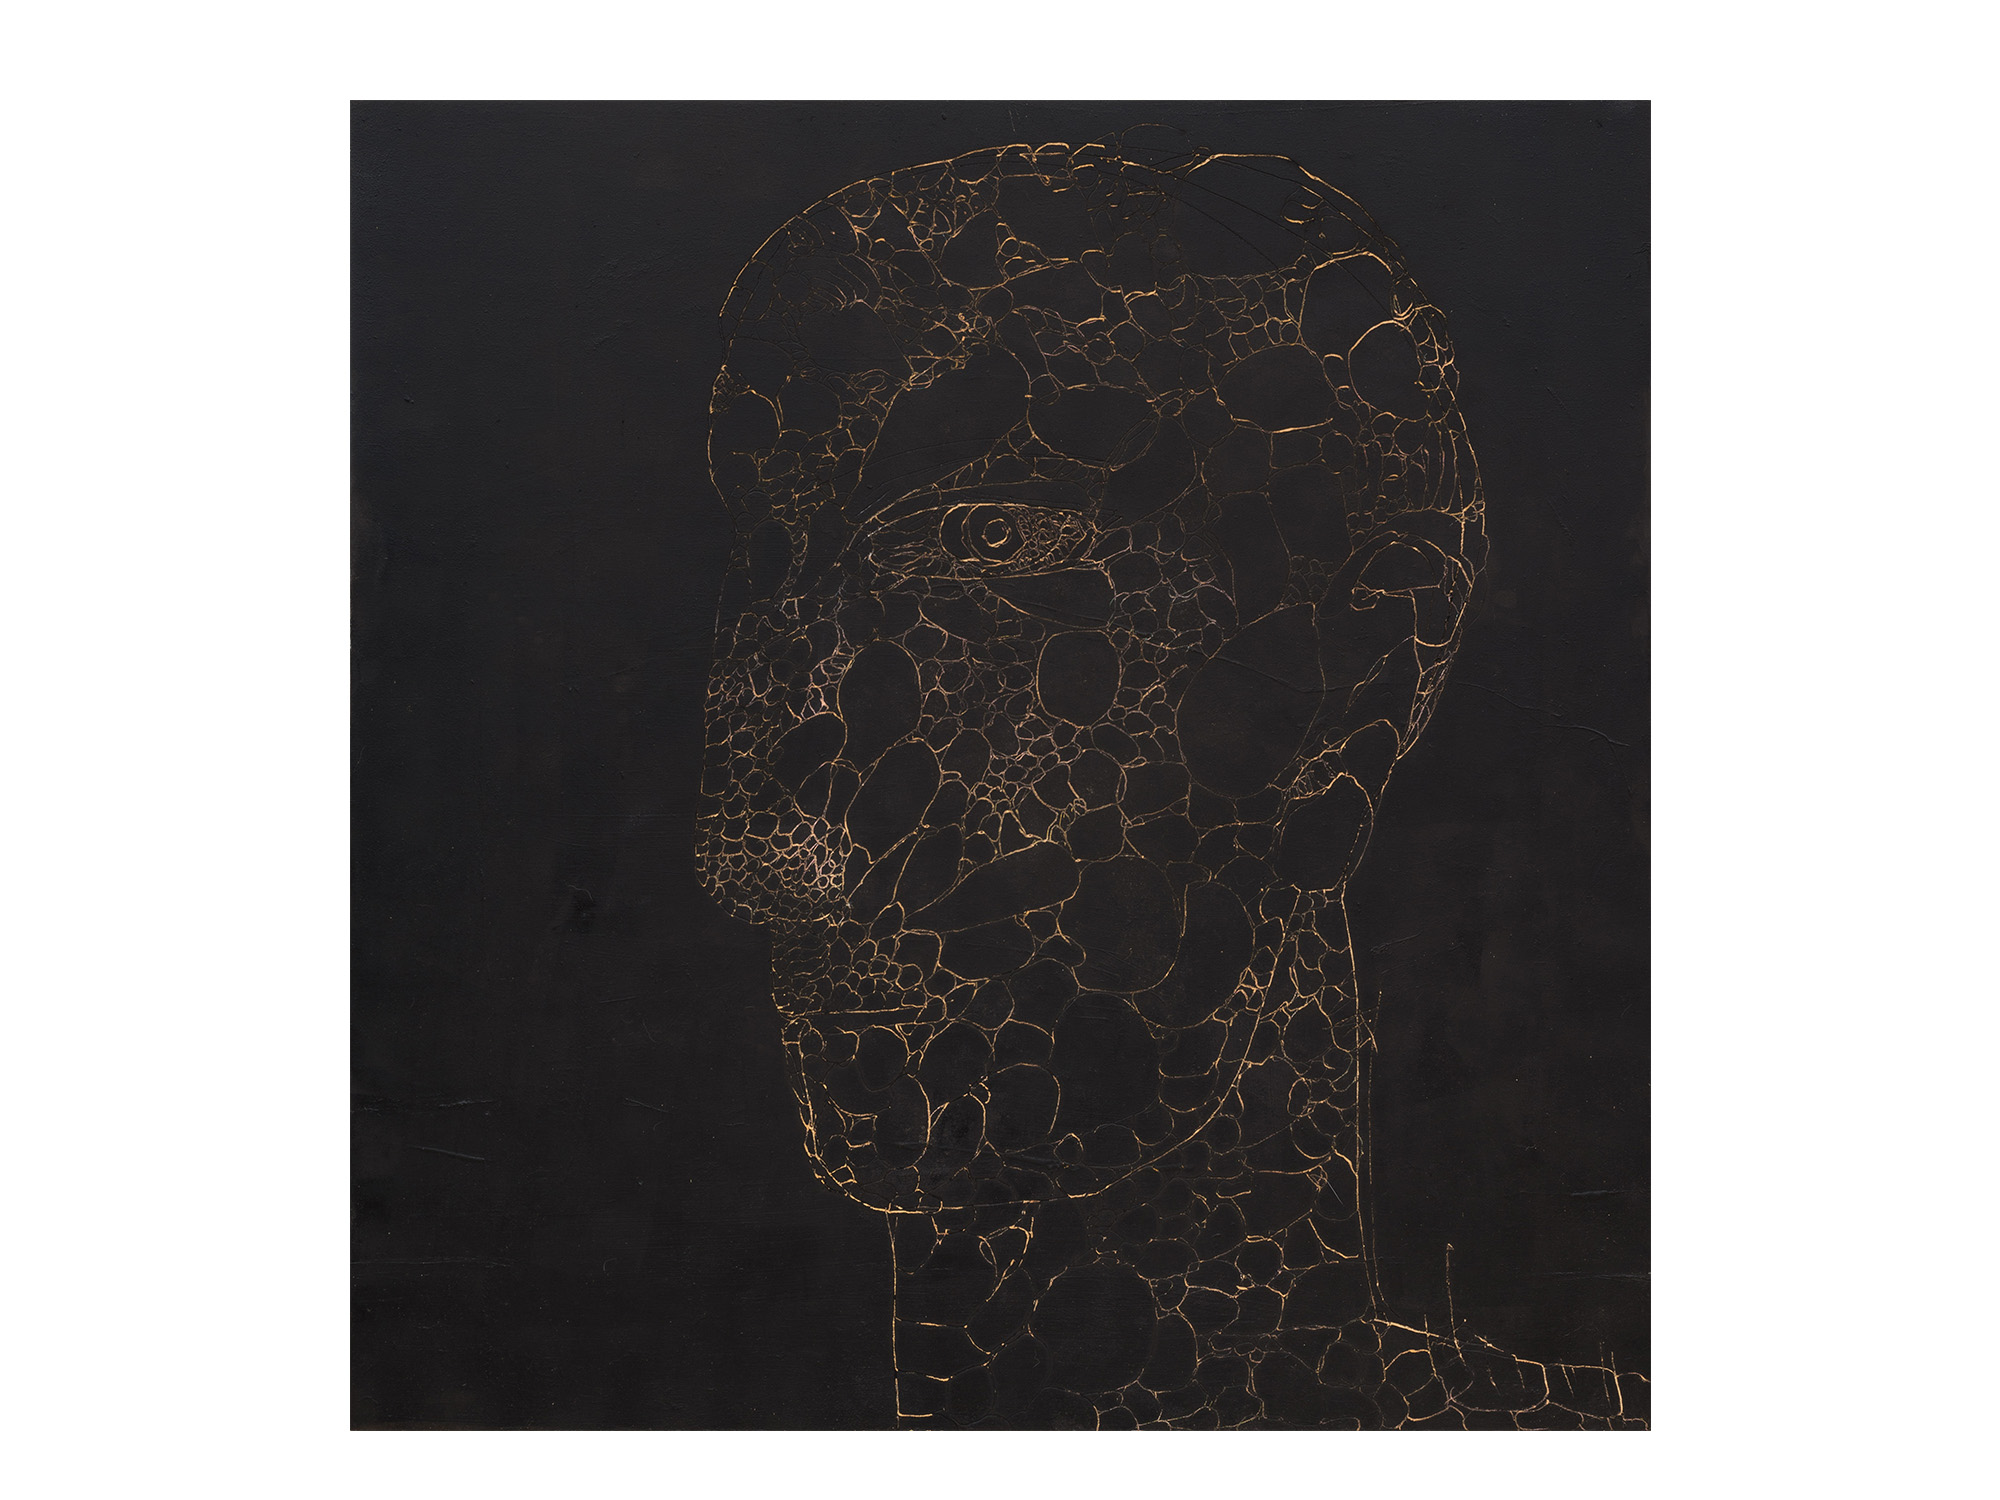 Robert Doble   Them They , 2018 oil on archival marine ply 120 x 122cm   ARTIST BIO